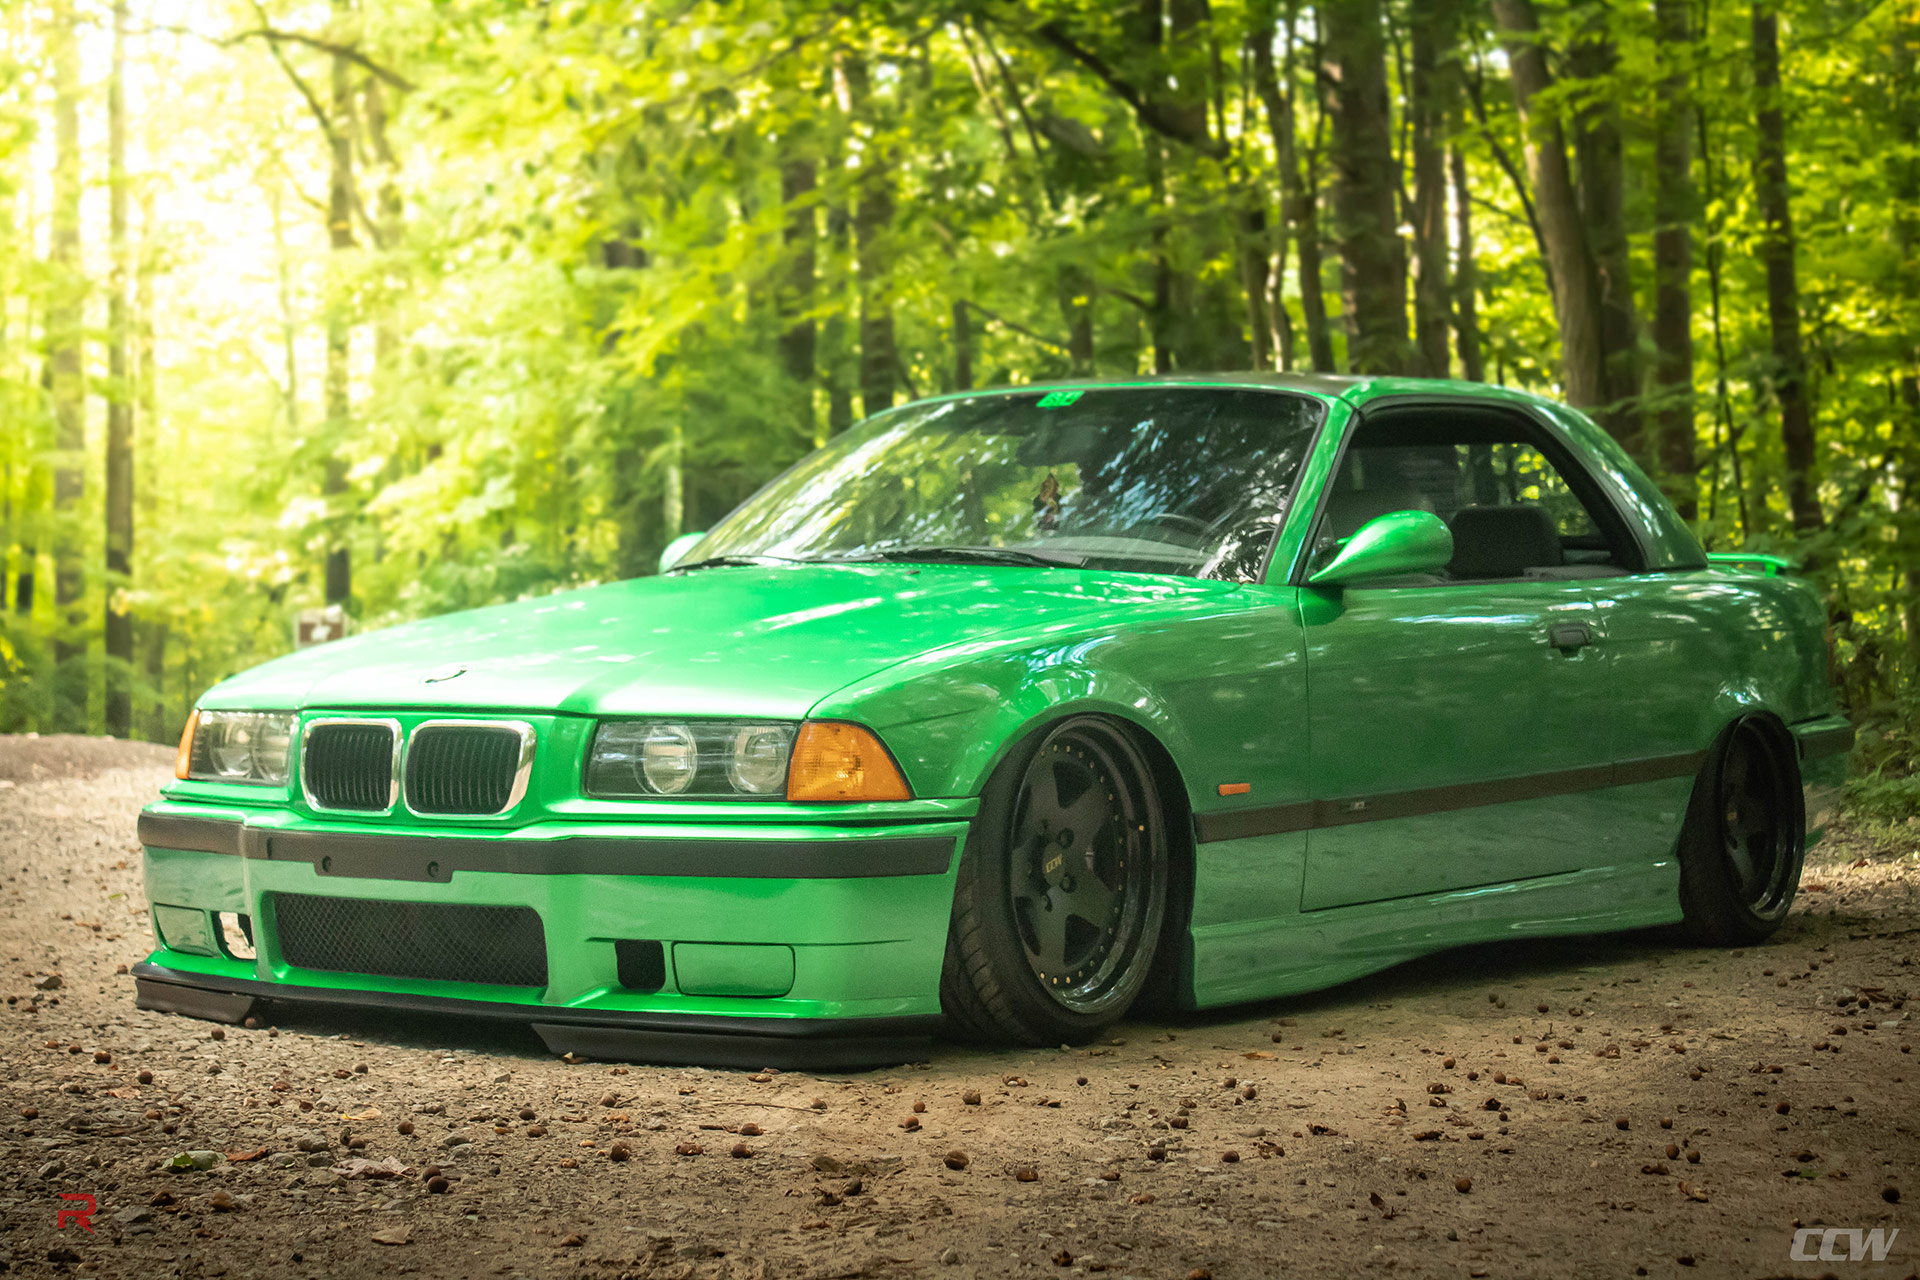 hight resolution of green bmw e36 m3 ccw classic 5 wheels